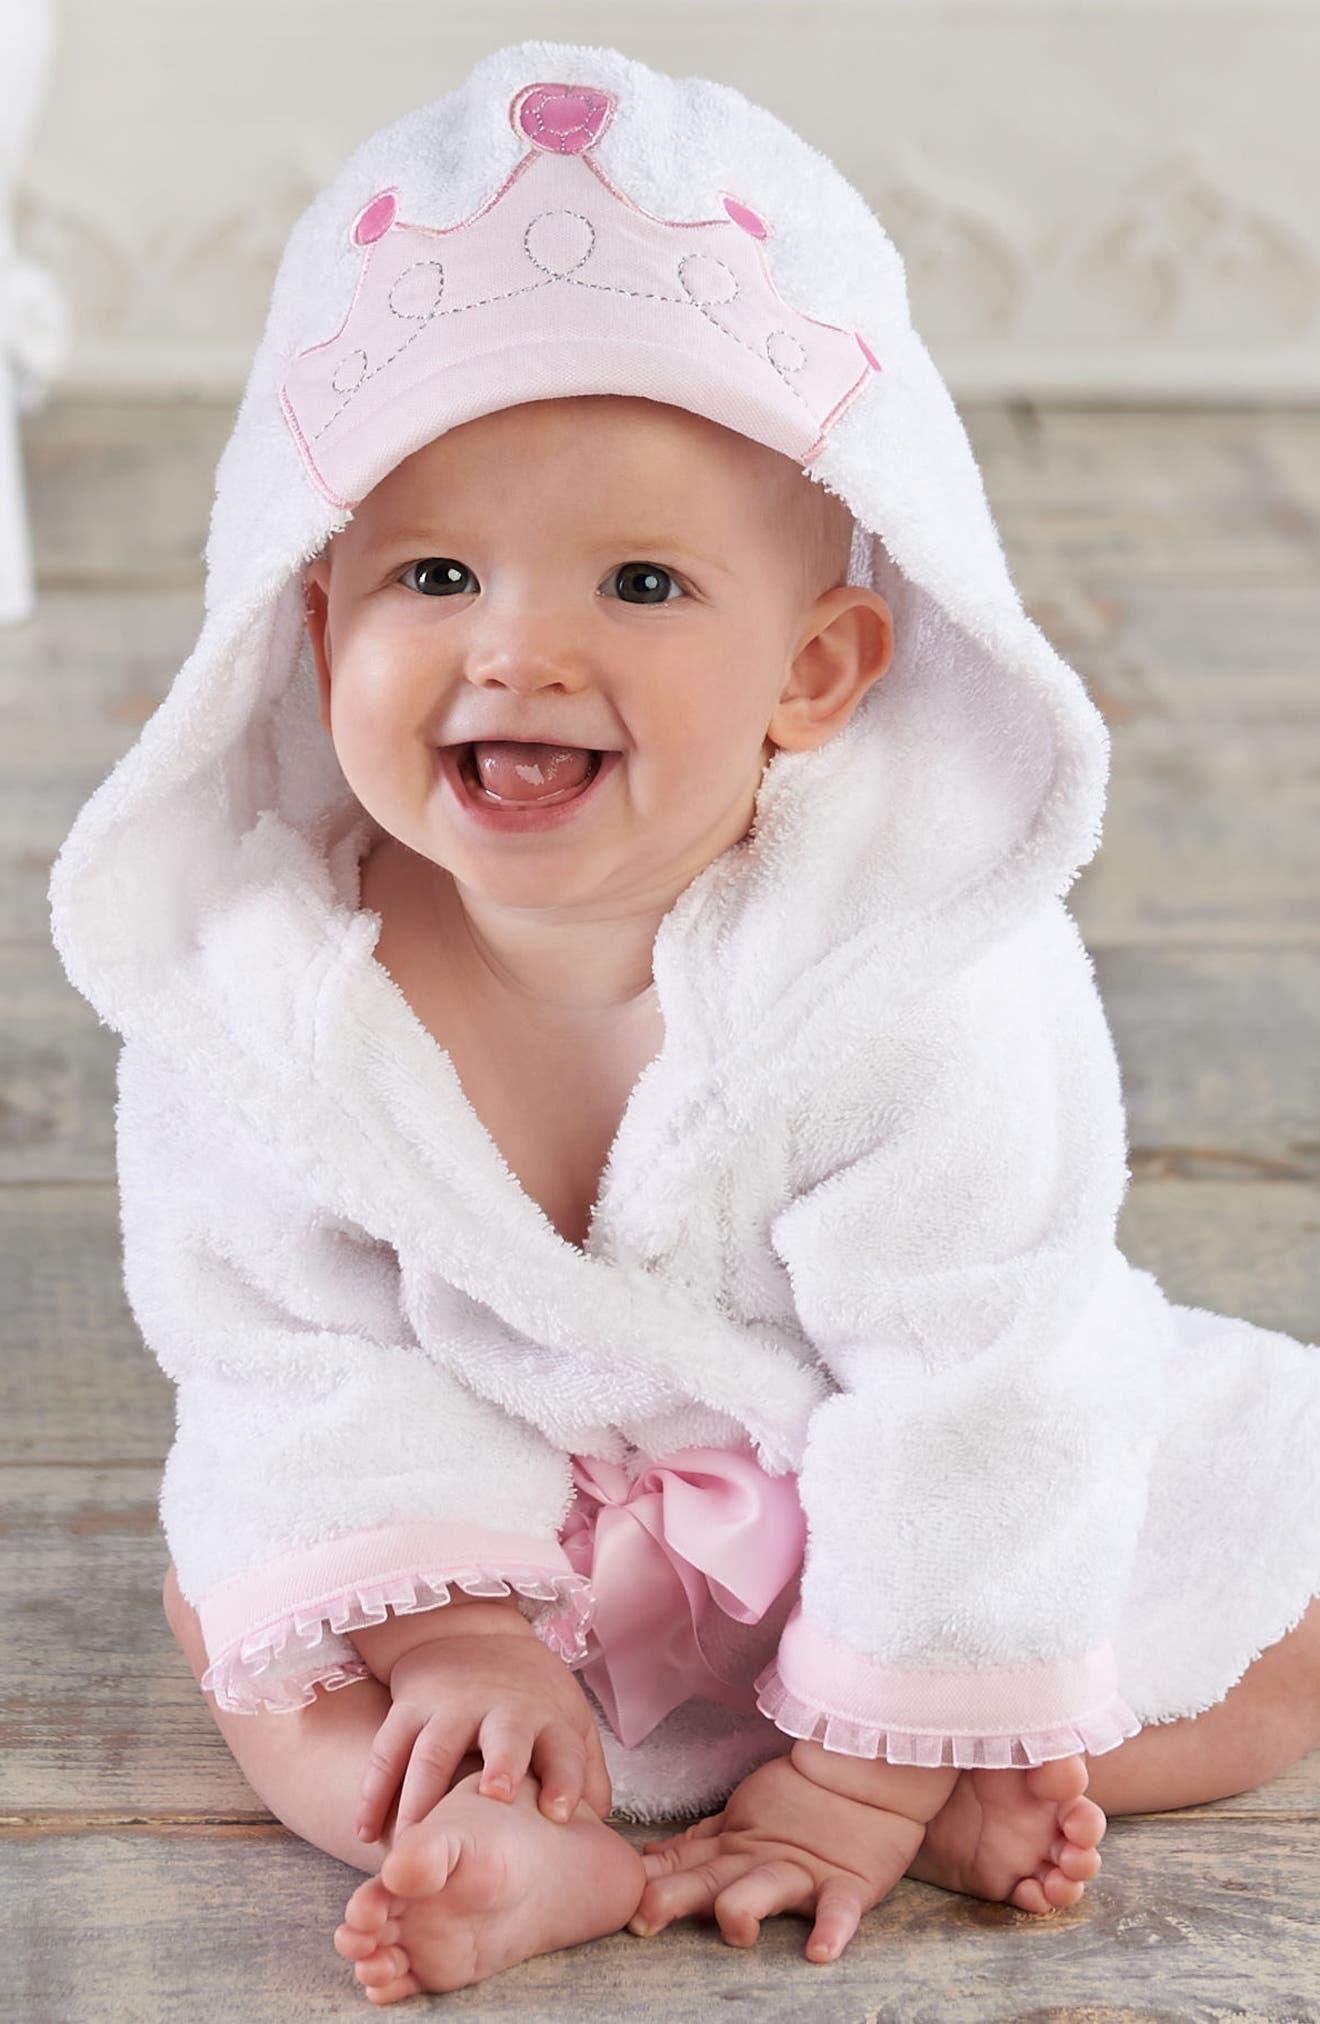 Little Princess Plush Robe, One-Piece Pajamas & Hat Set,                             Alternate thumbnail 2, color,                             690